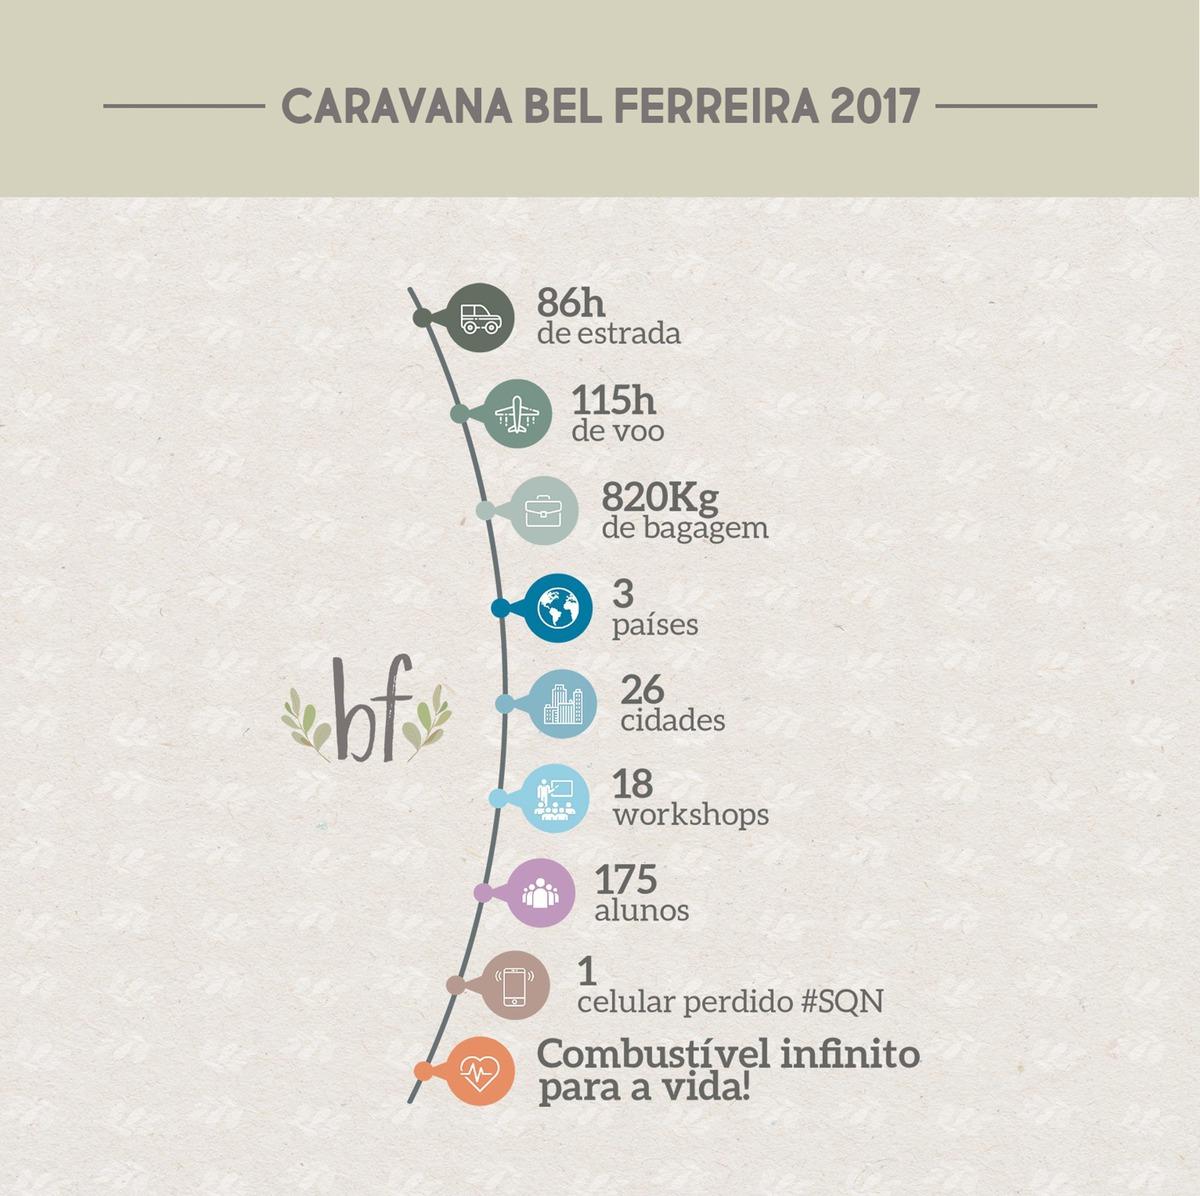 Imagem capa - Caravana da Bel - 2017 por Bel Ferreira